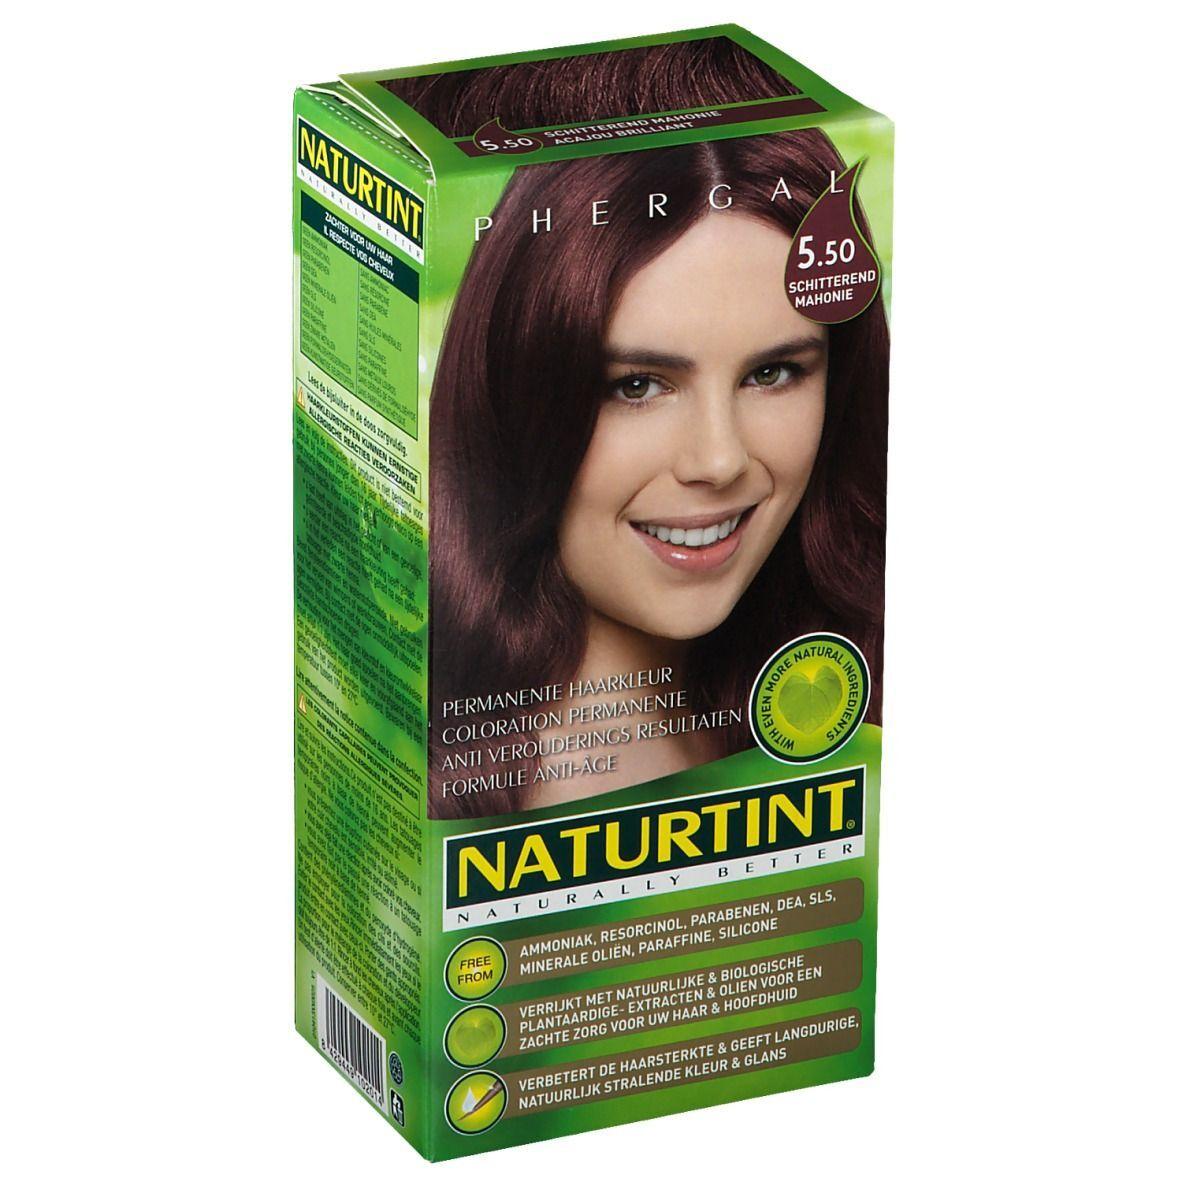 NATURTINT® Coloration Permanente 5.50 Acajou scintillant ml emballage(s) combi